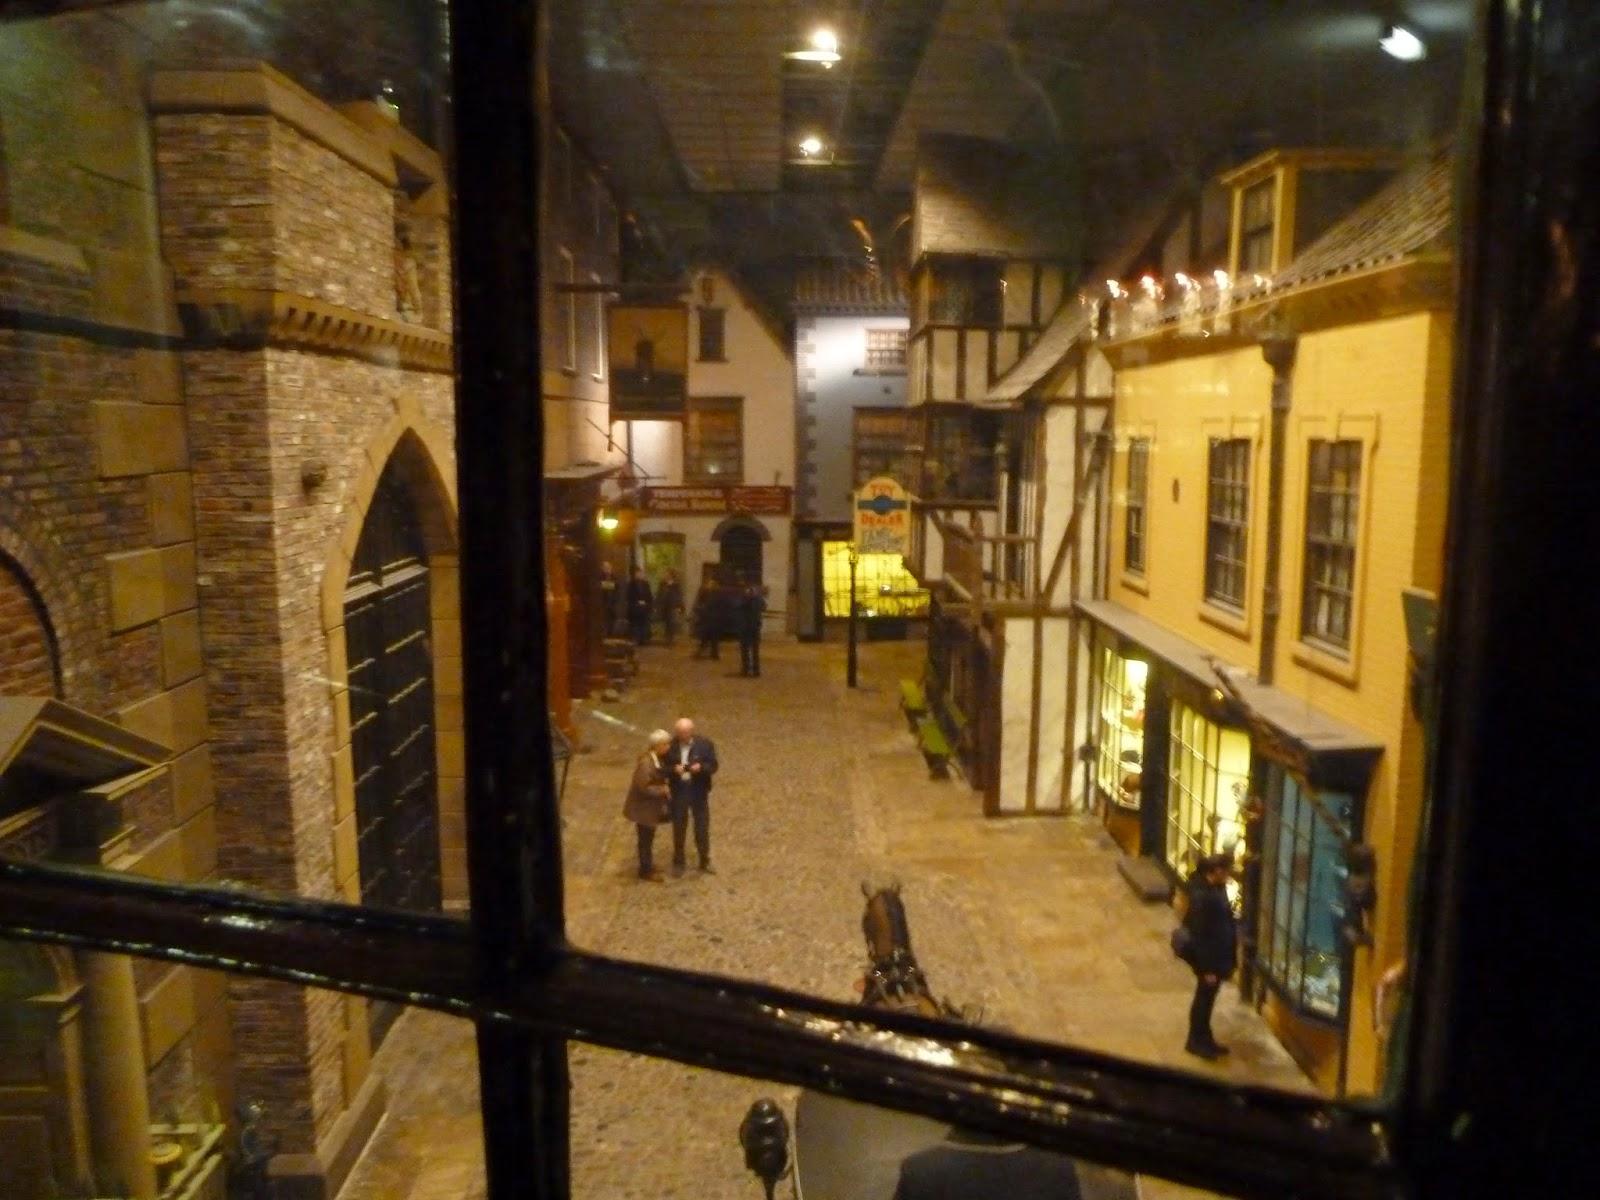 Visiting York Castle Museum parking